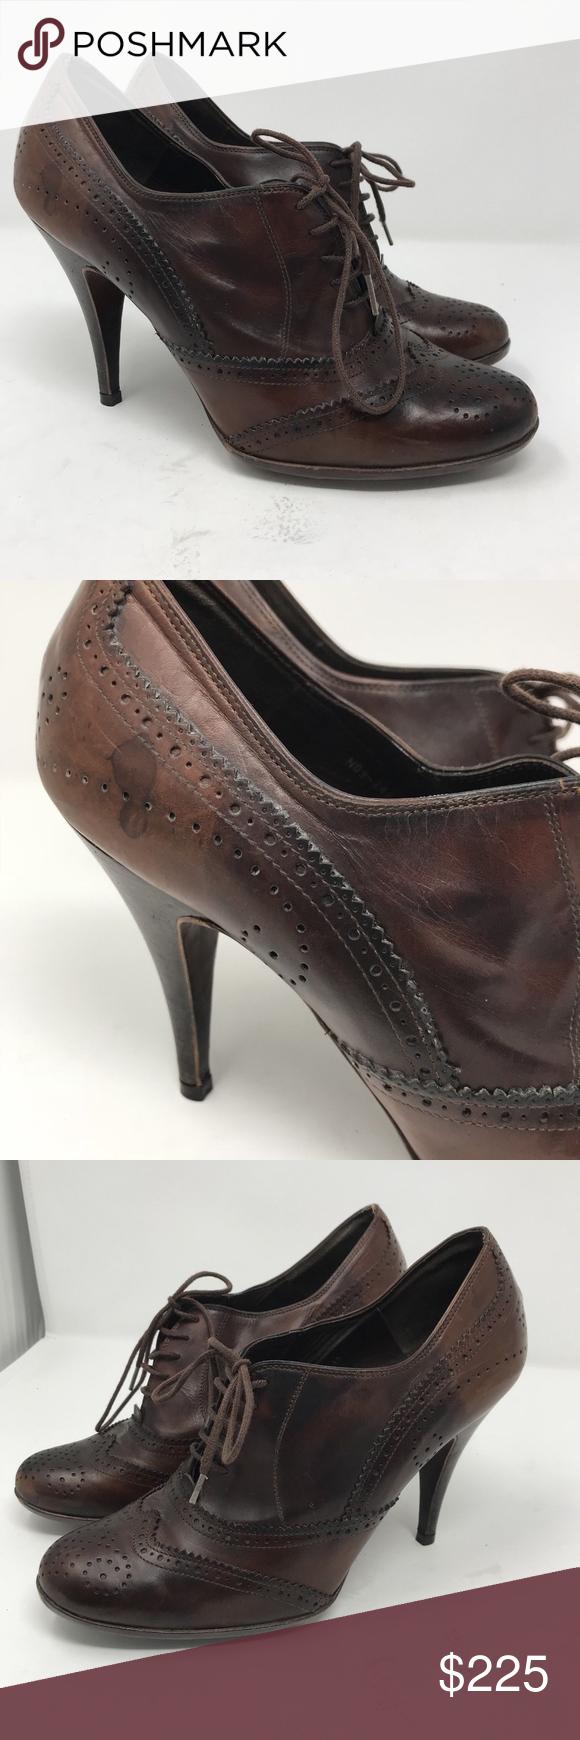 Pedro Garcia Maddie Leather Brogue Pumps Size  IT 39 Wingtip Shoe